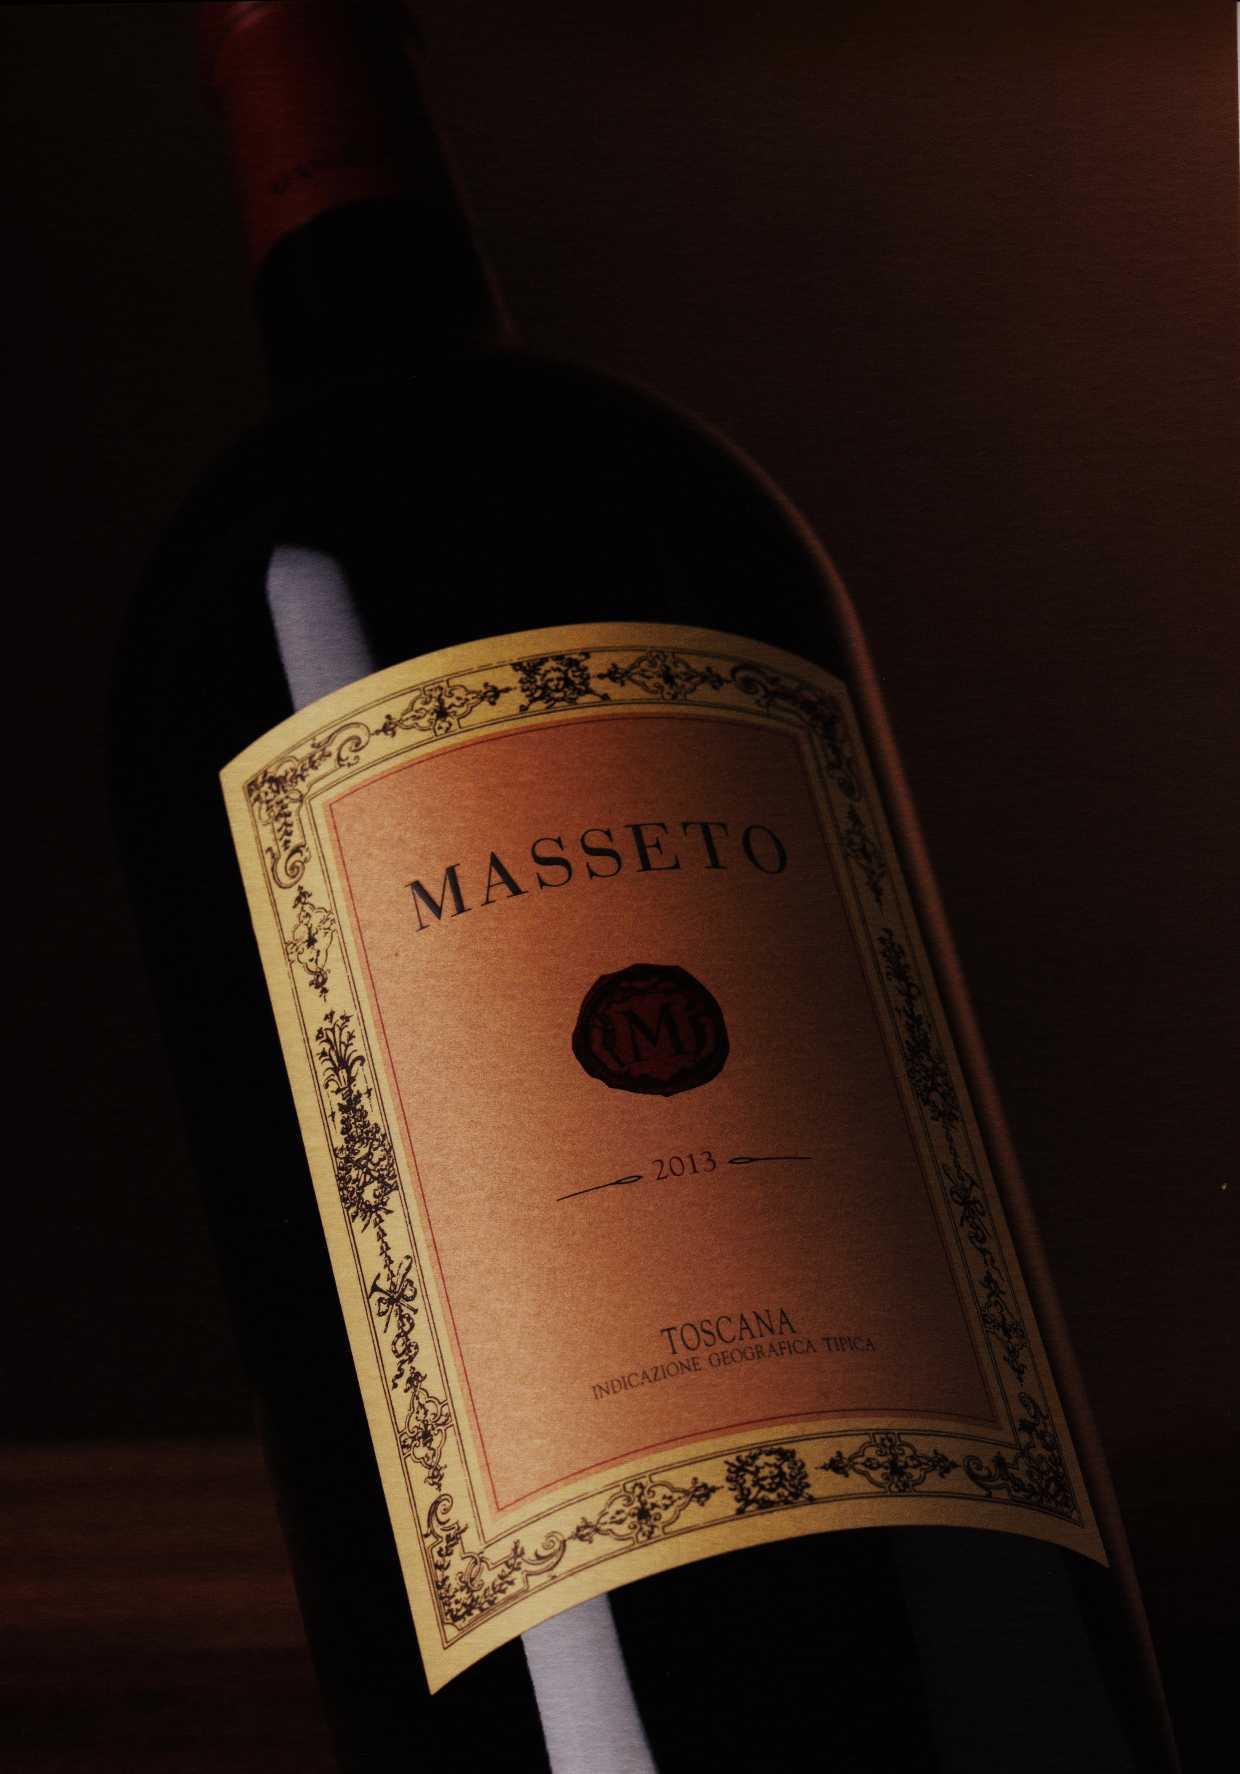 Masseto only for Boeucc Milan